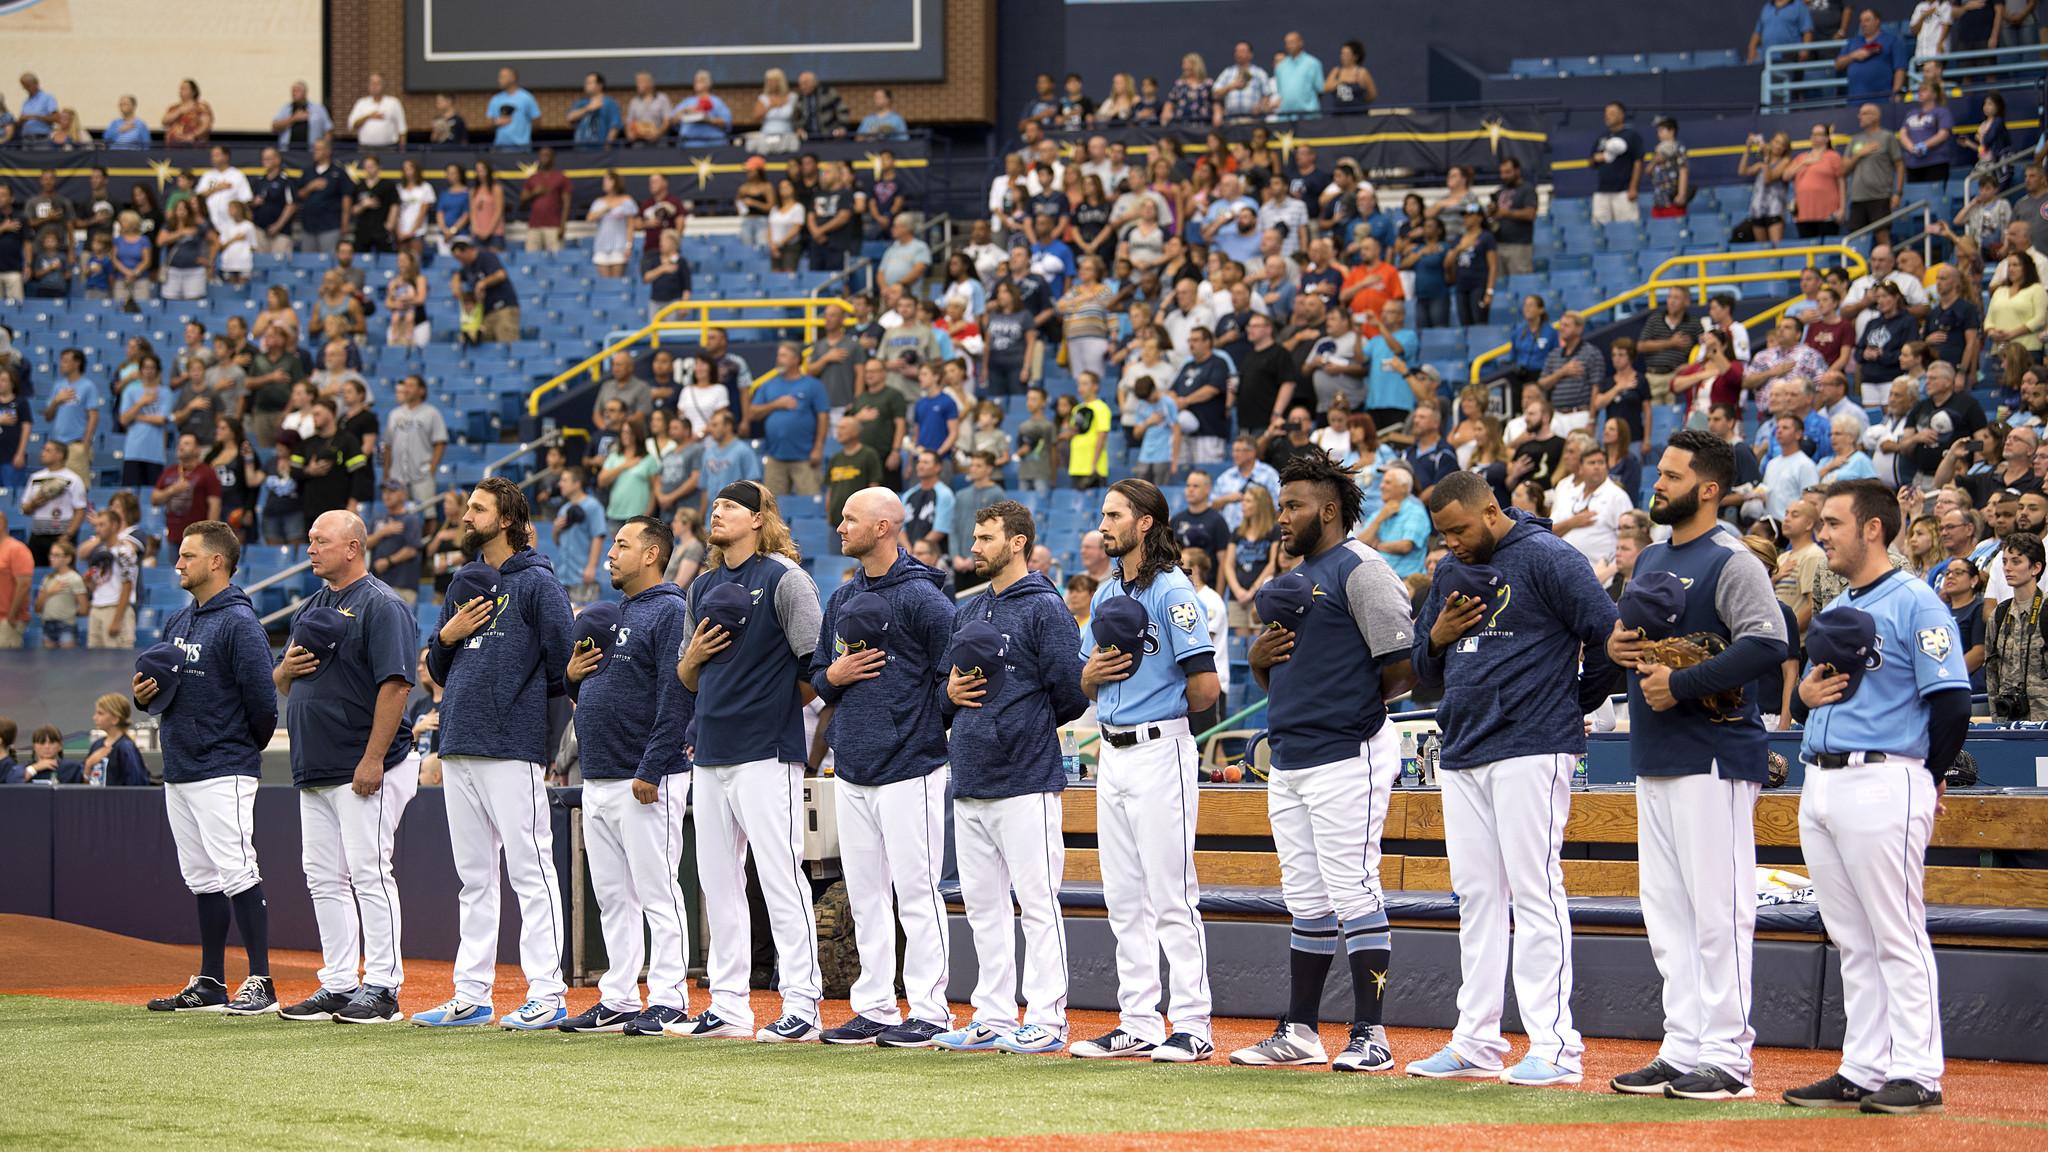 MLB PREVIEW 2020: PREDICTING THE UNPREDICTABLE